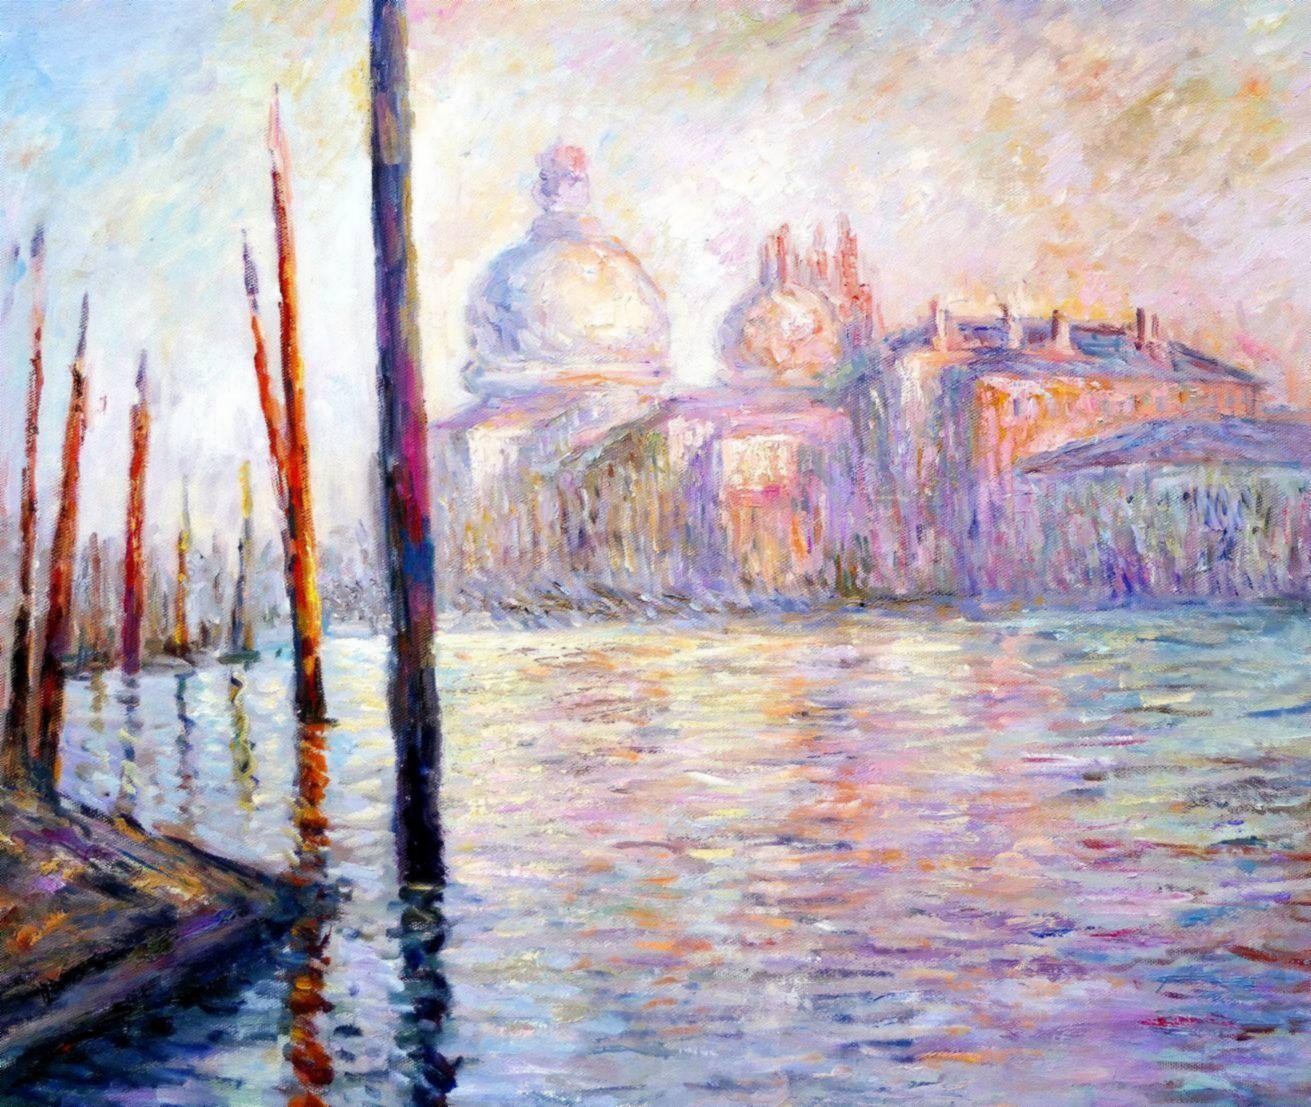 Claude Monet - Blick auf Venedig c97221 50x60cm exzellentes Ölgemälde handgemalt Museumsqualität